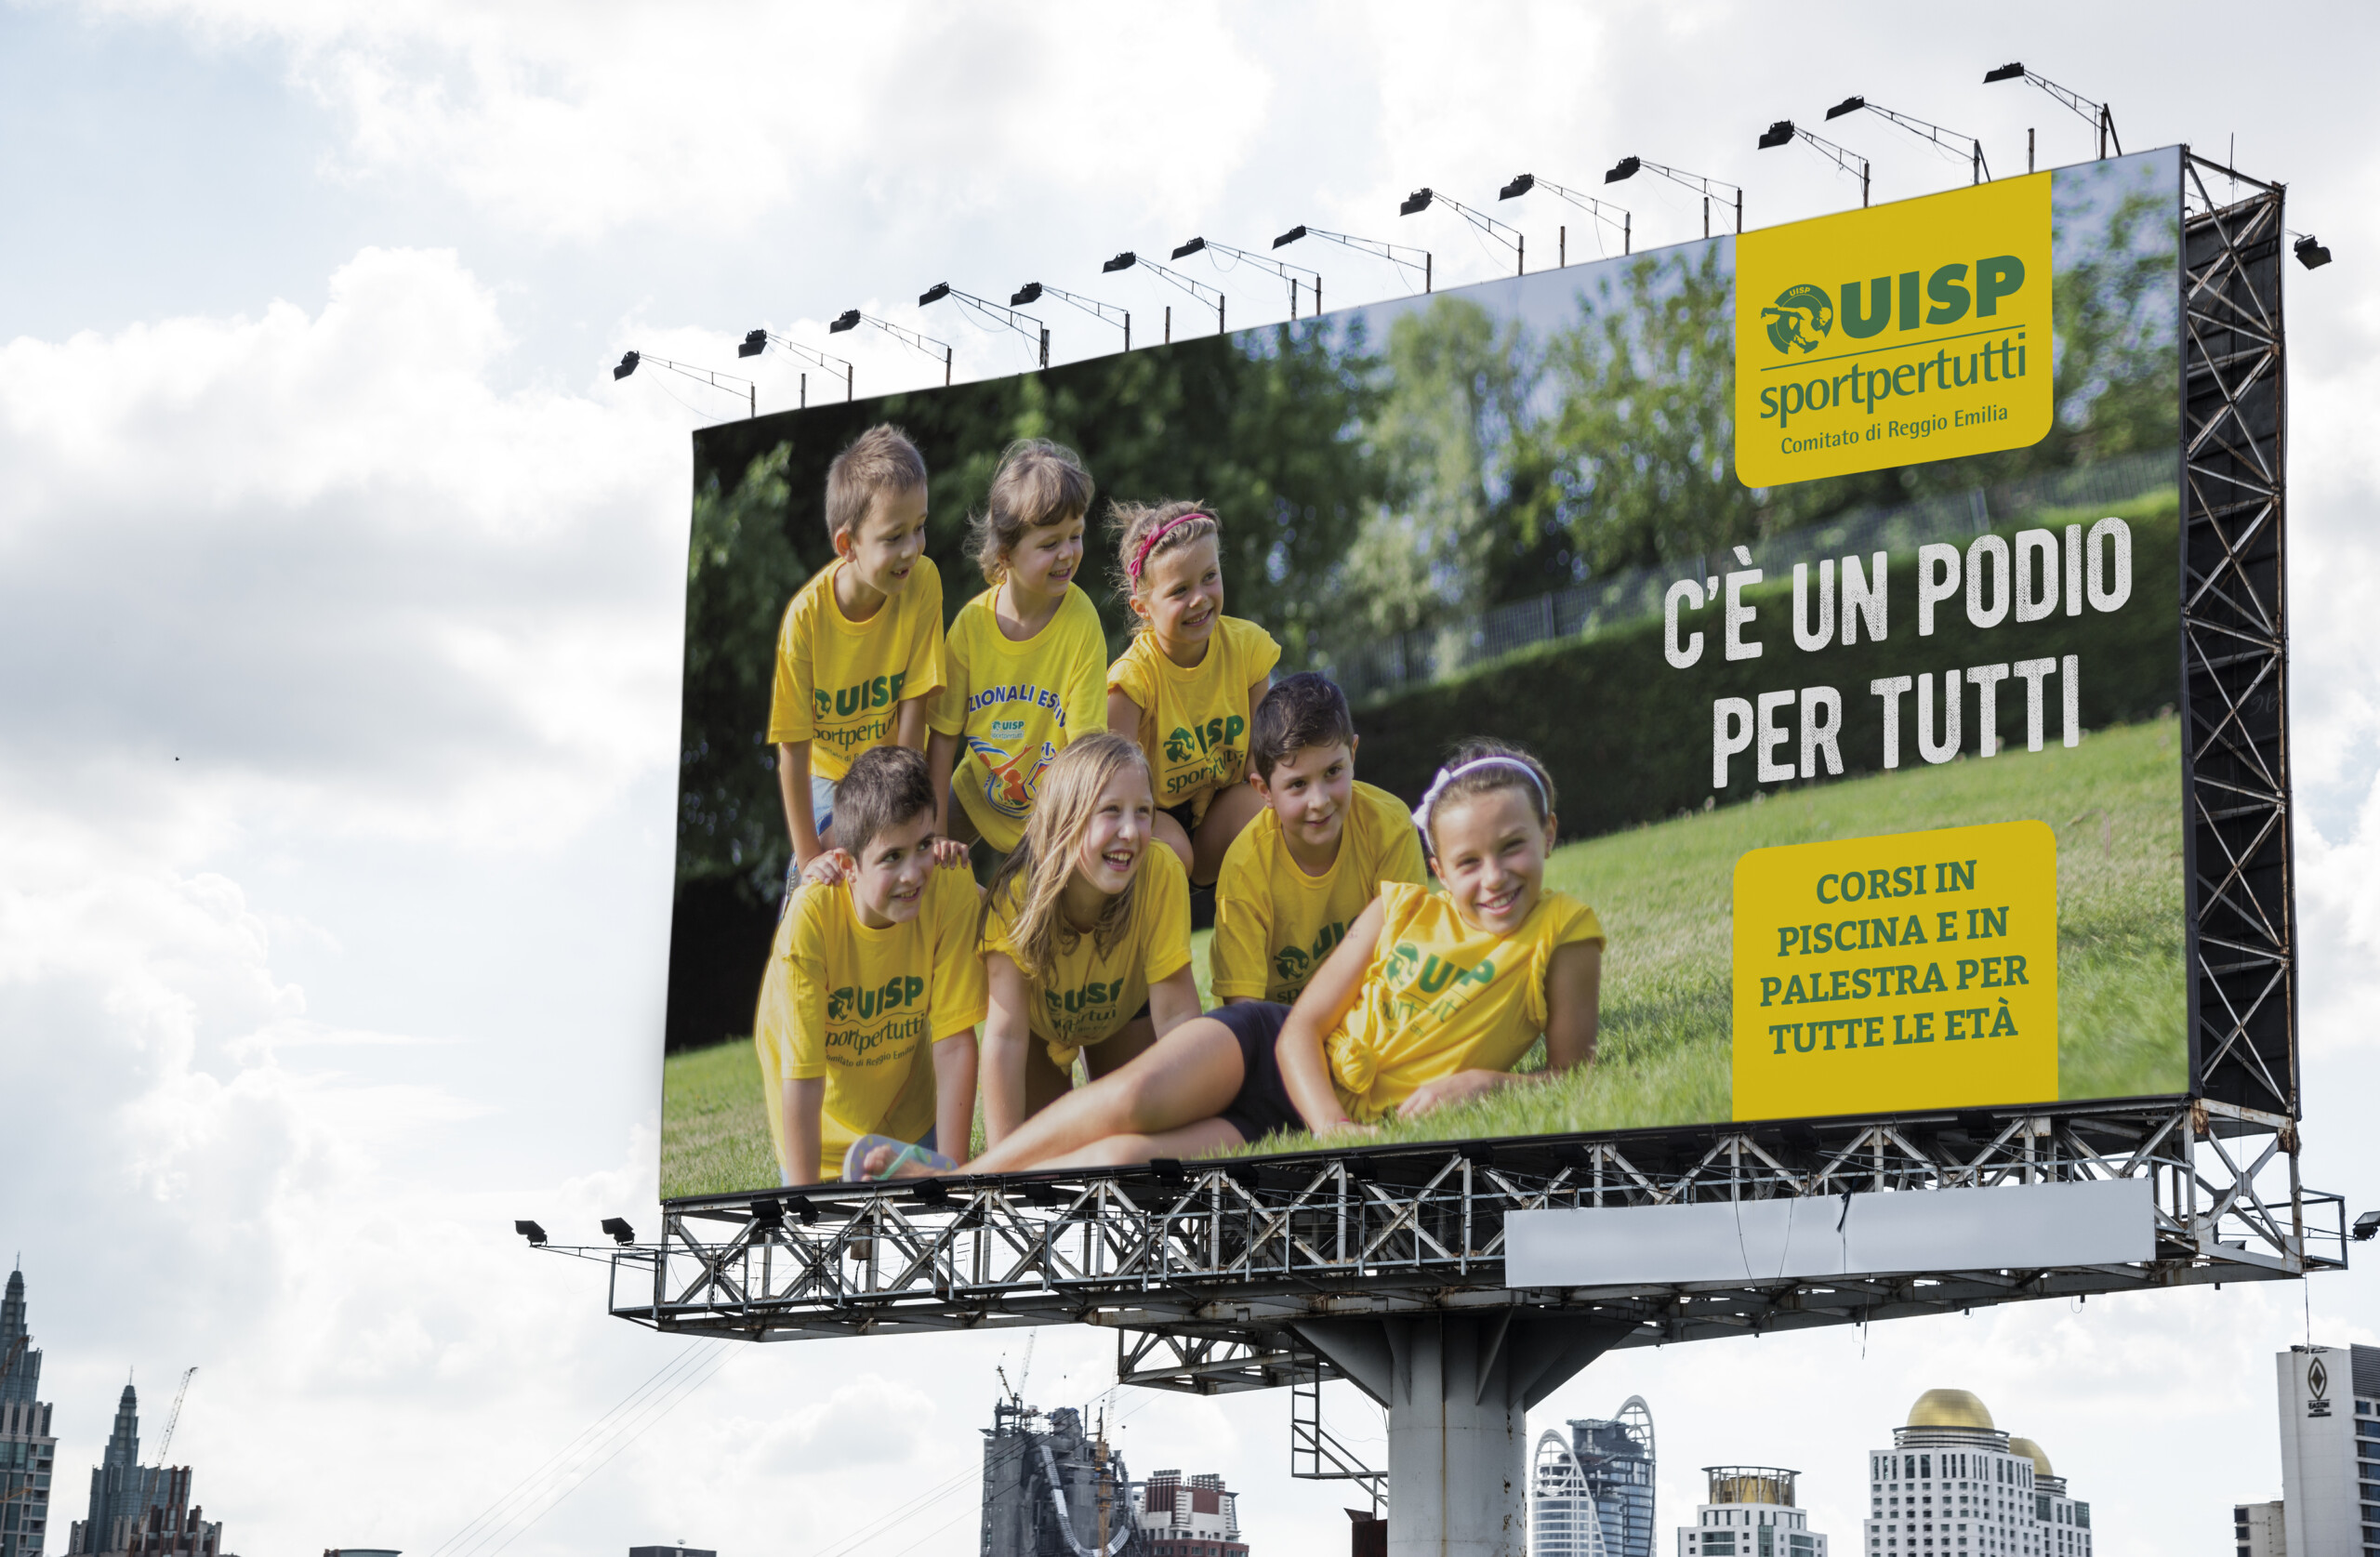 fluidlab UISP billboard outdoor adv UISP scaled